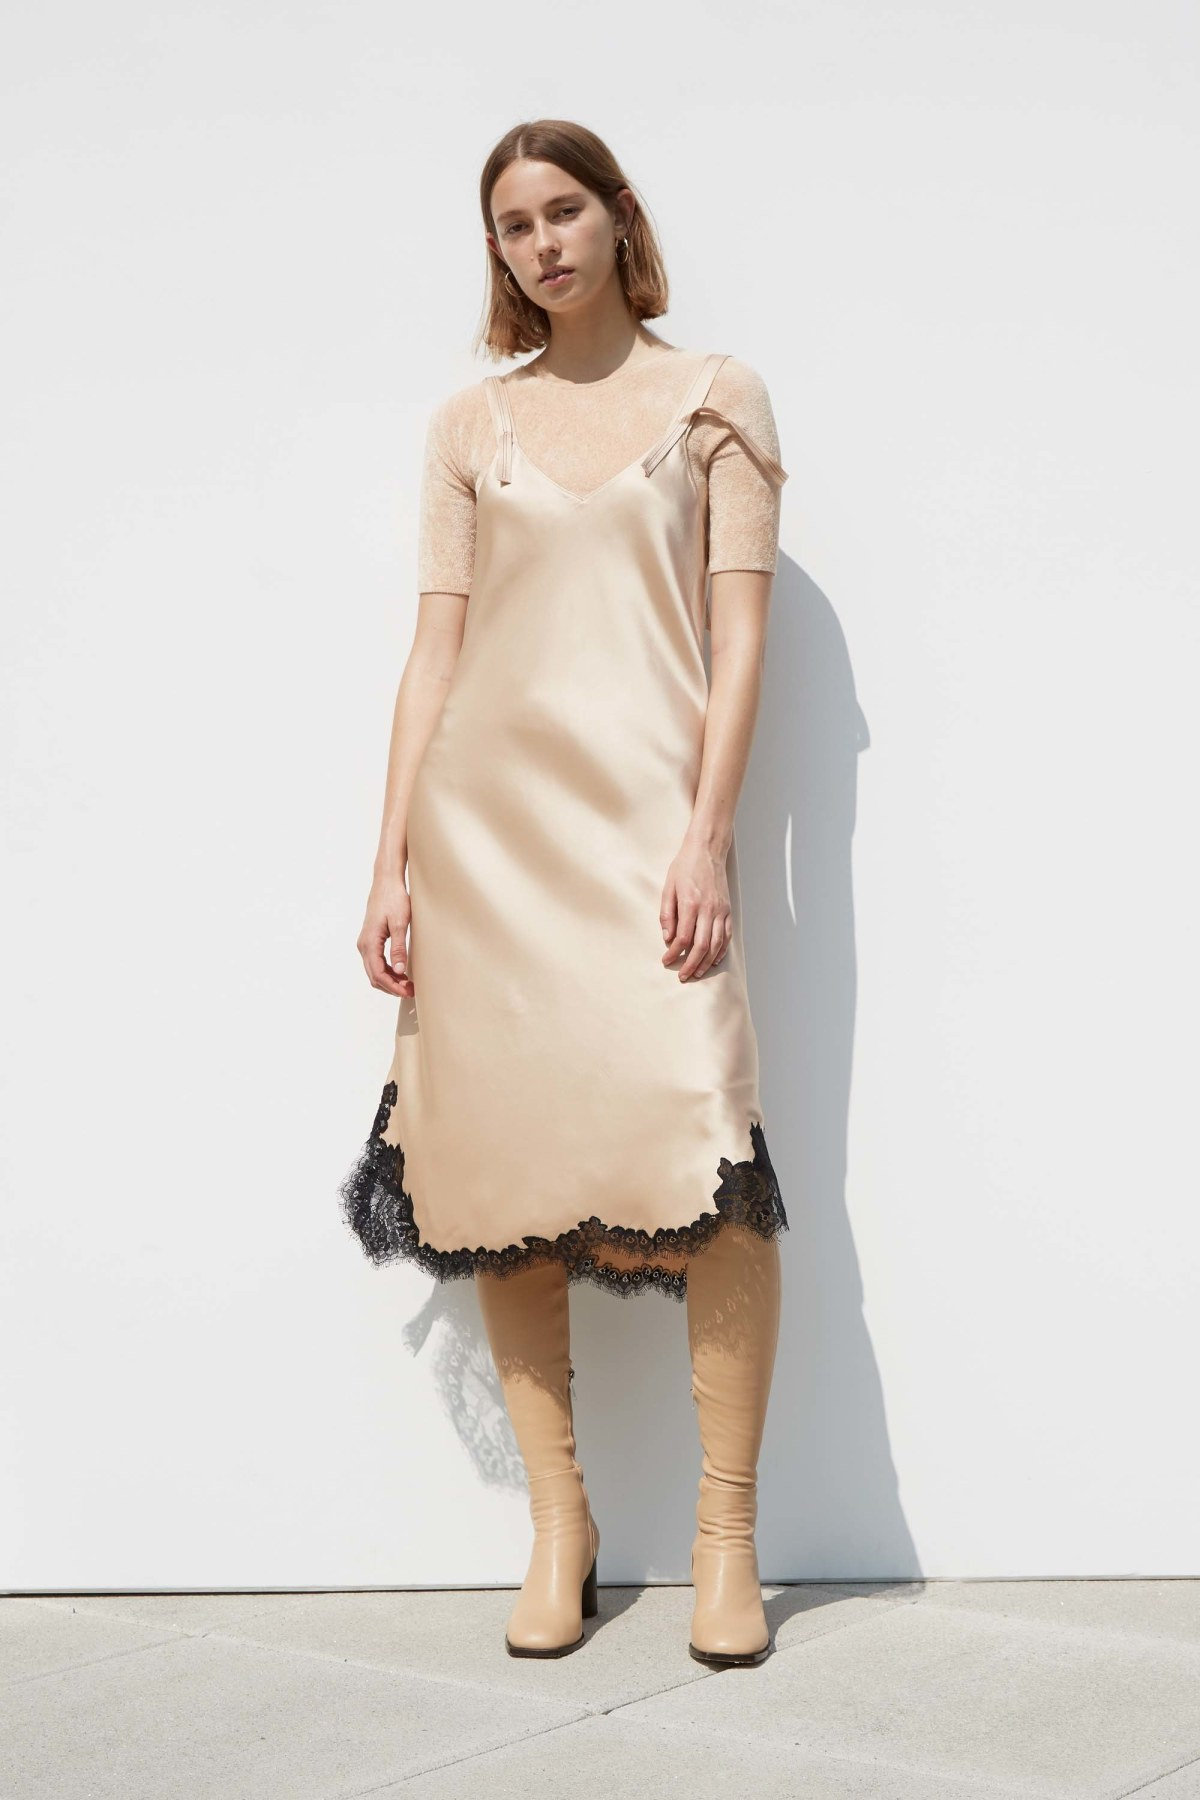 helmut-lang-resort-2017-fashion-show-the-impression-05